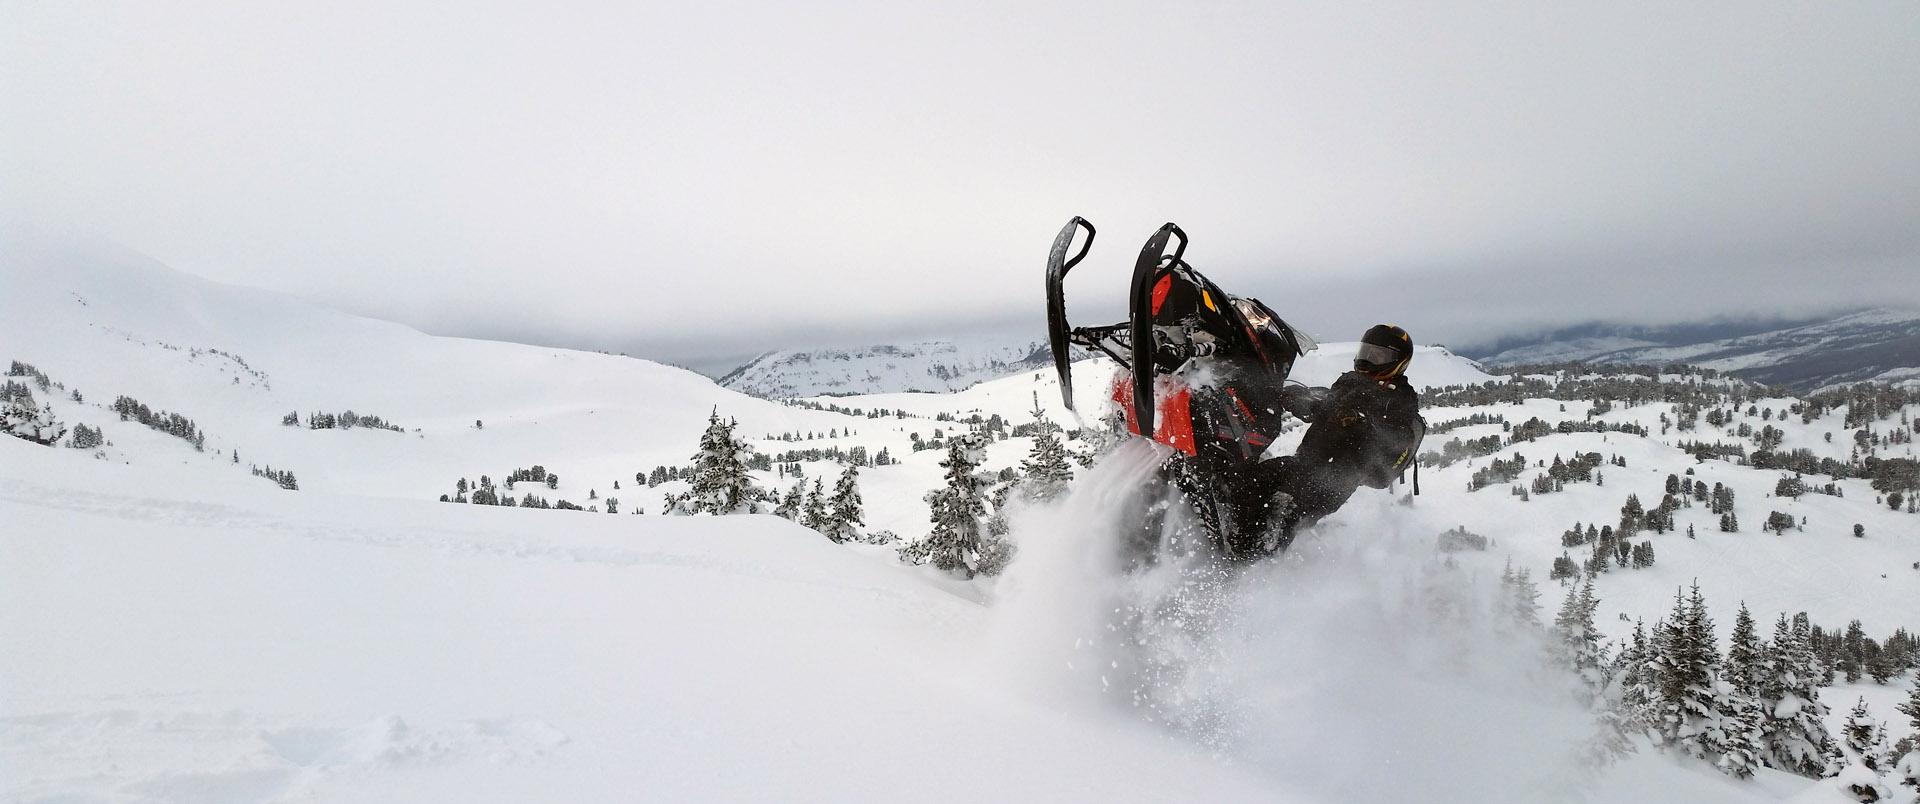 seth_sled